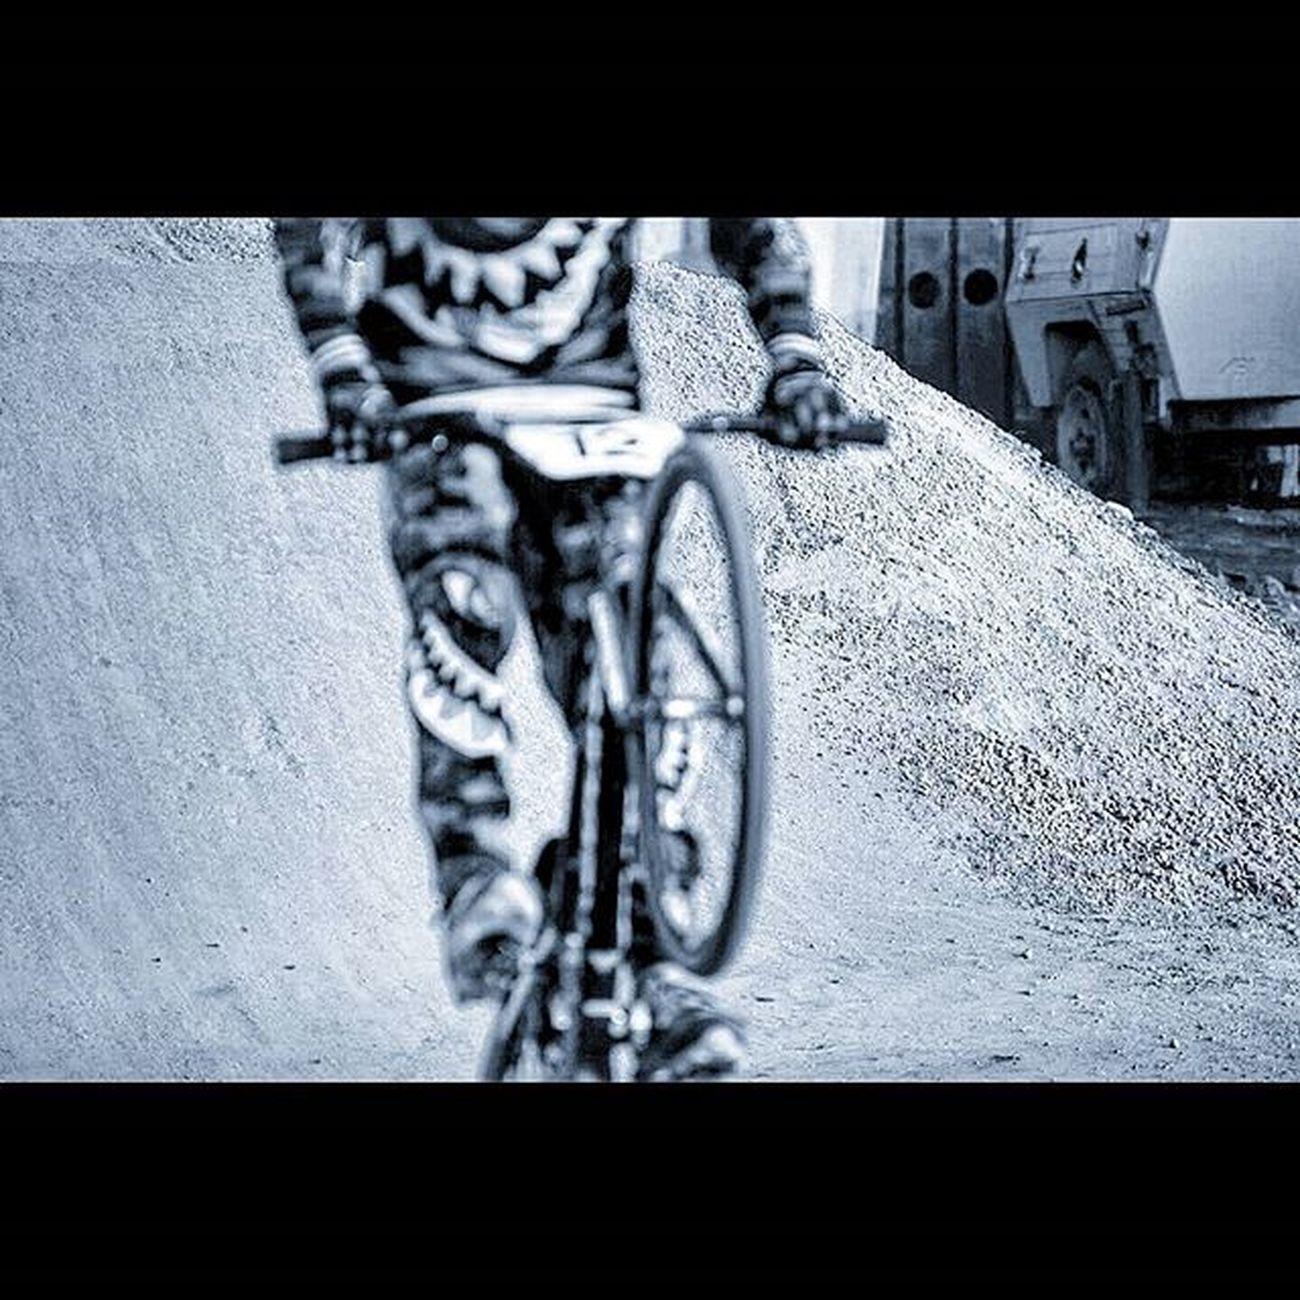 Steezy Nikon D3200 Bmx  Racing Manual Troylee Steezy